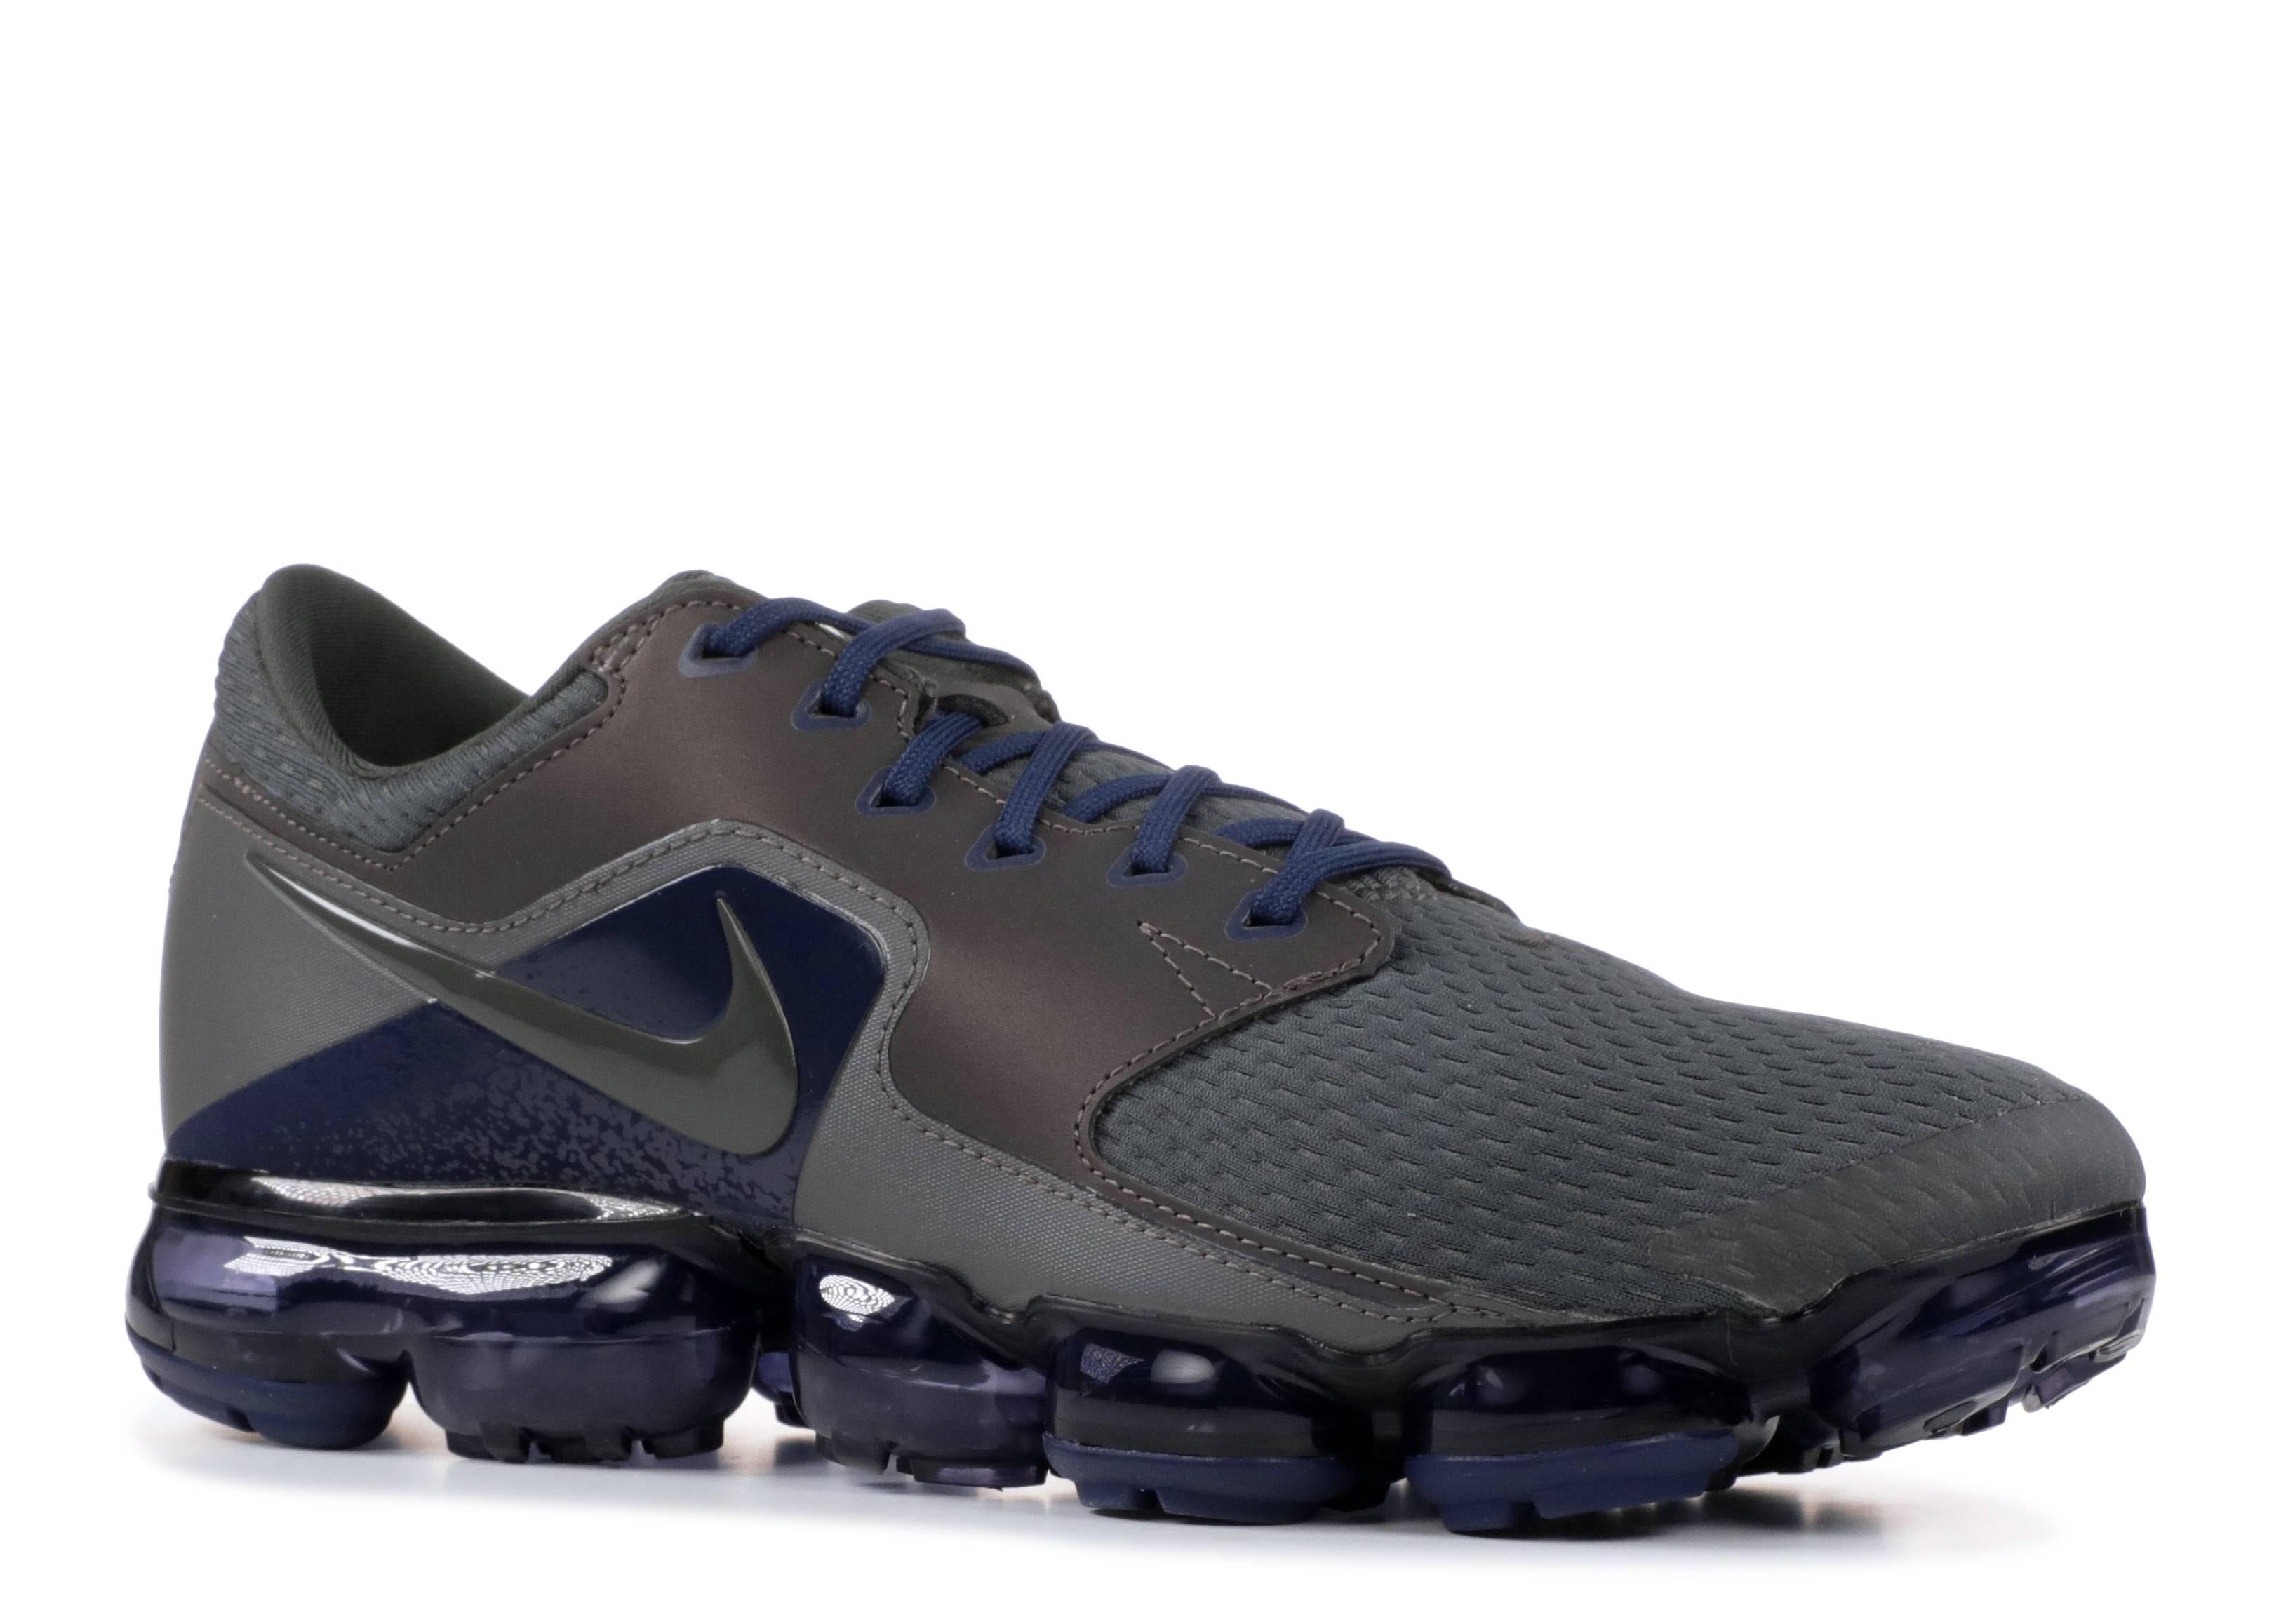 05b8d079eb Nike Air Vapormax R - Nike - aj4469 002 - midnight fog/midnight fog |  Flight Club